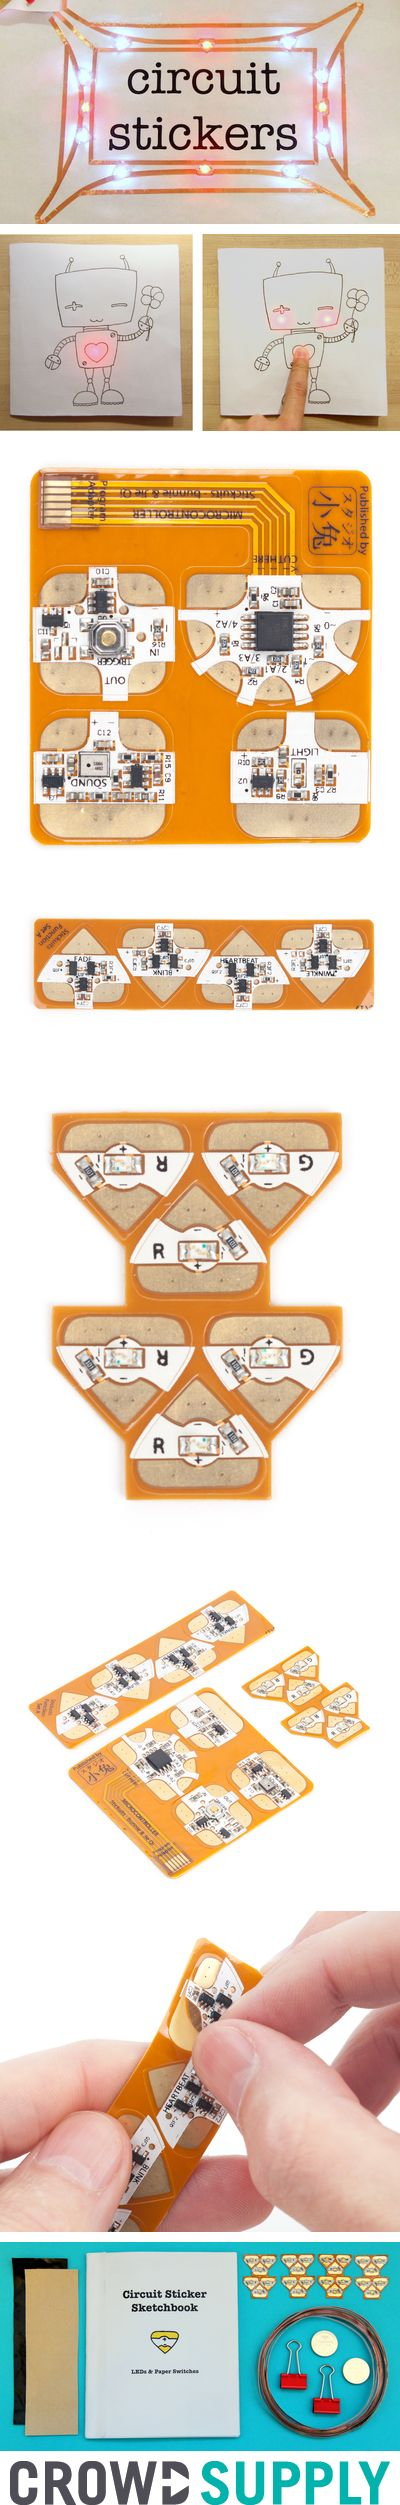 Circuit Stickers